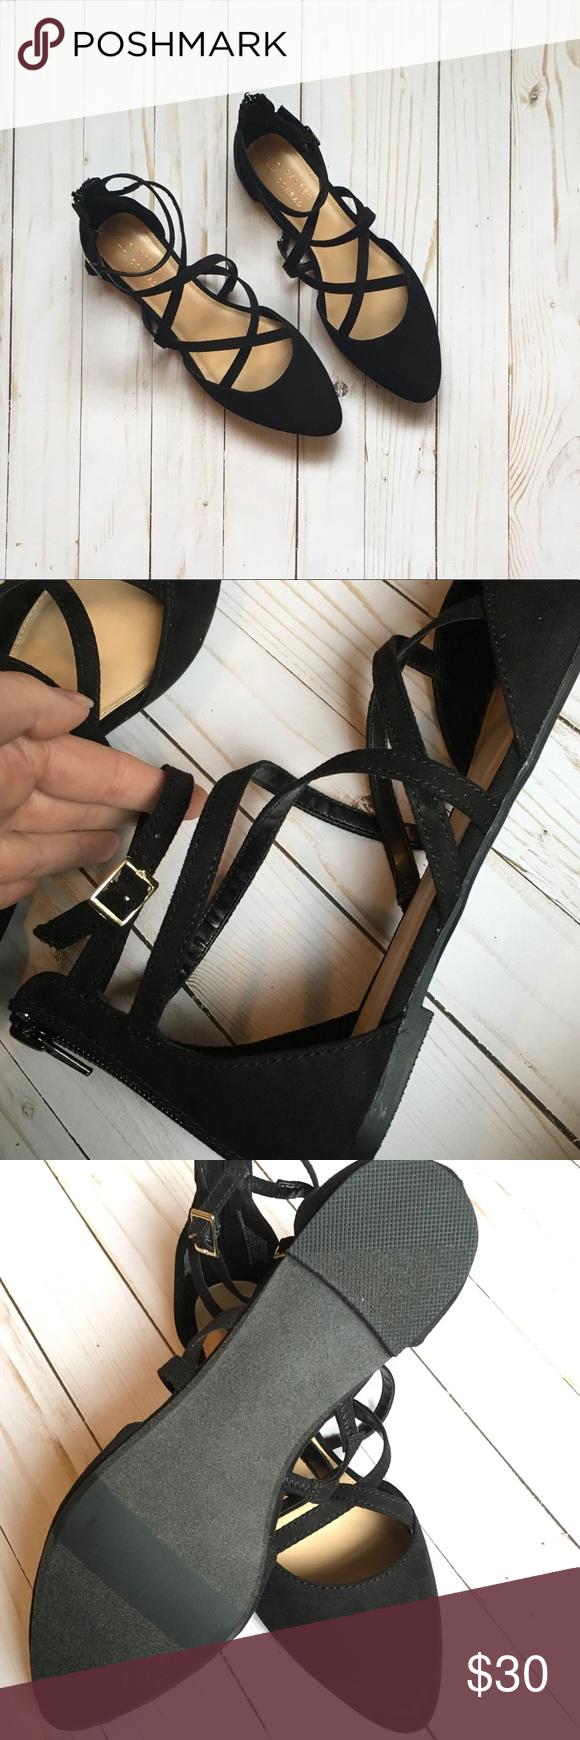 2/$20 LC Lauren Conrad Leopard Slide Sandals Good, pre